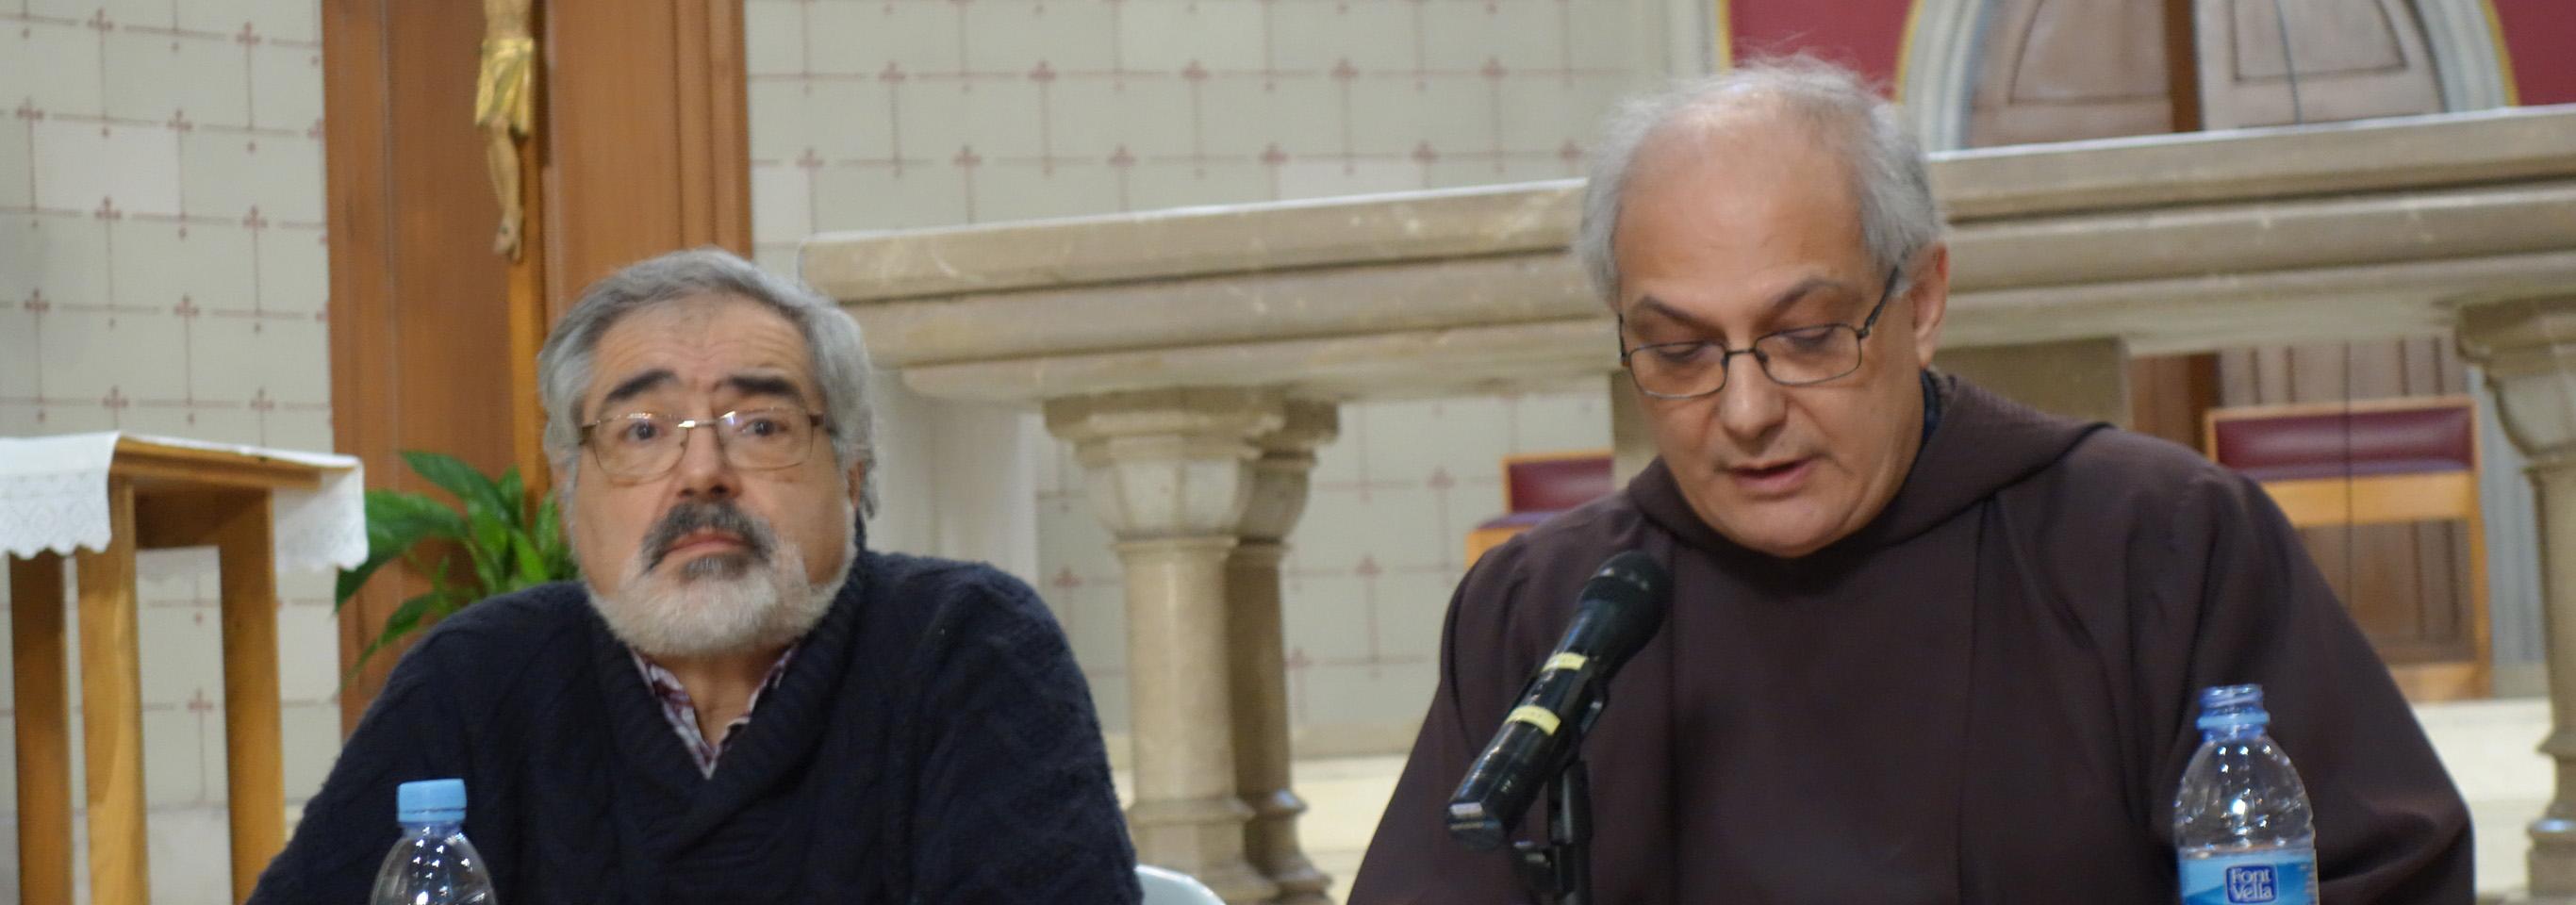 Eduard Sala i Josep Manuel Vallejo